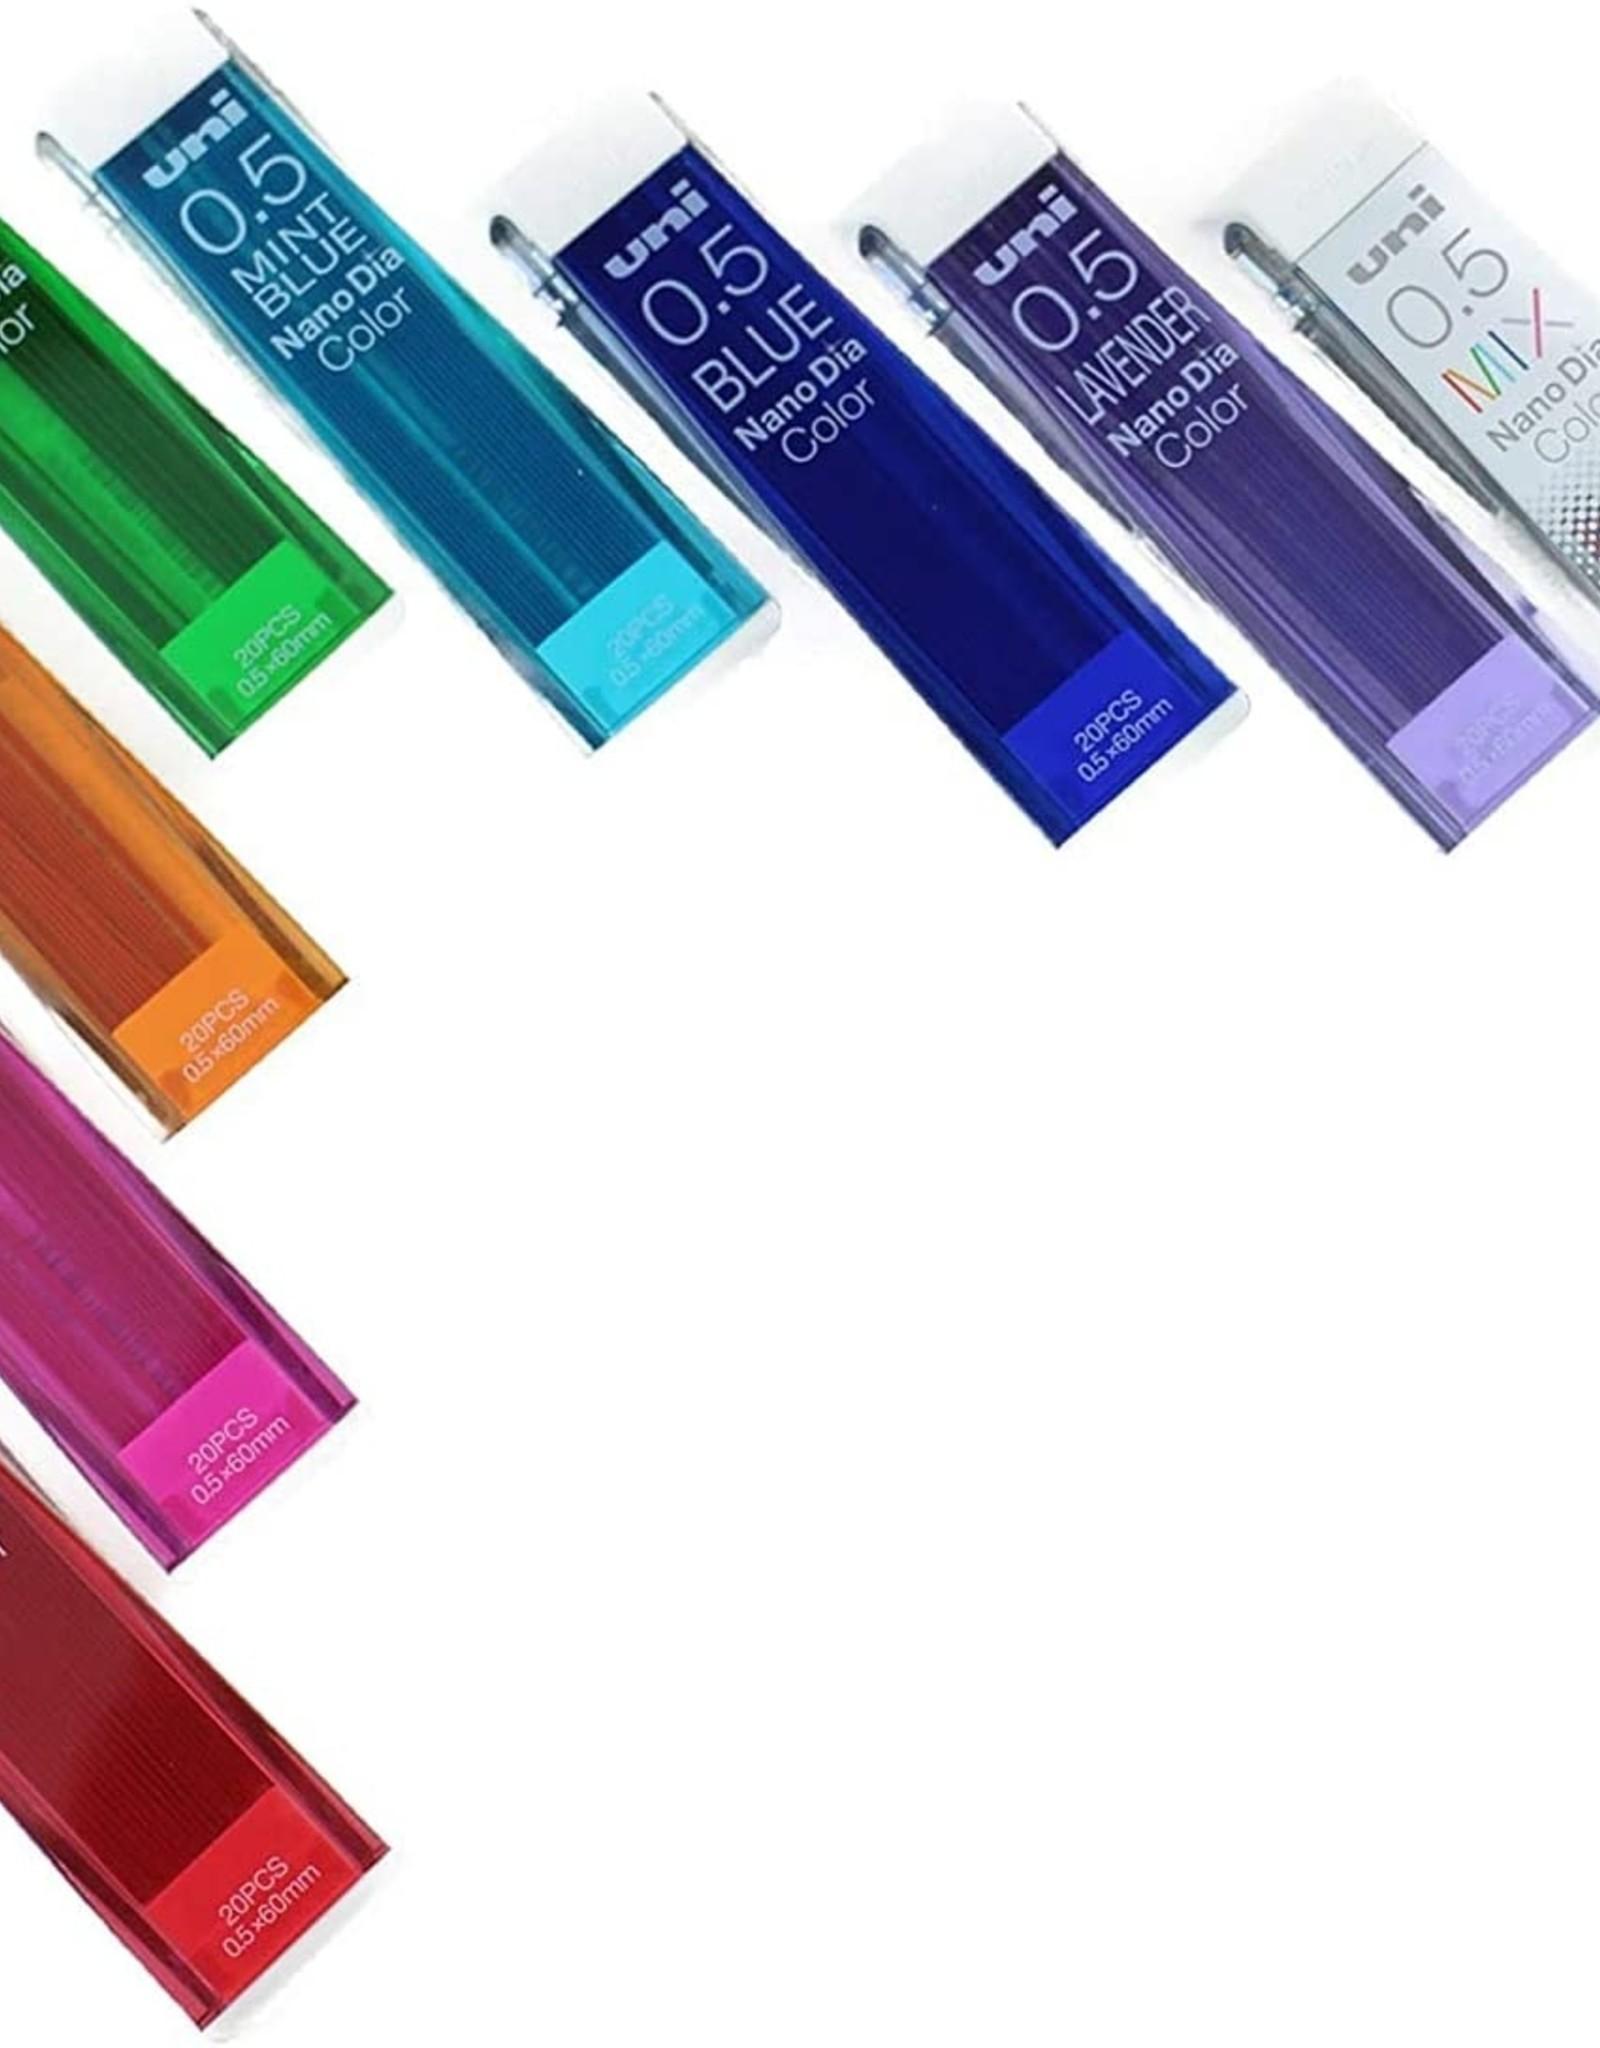 Mitsubishi Pencil Nanodia Color Mechanical Pencil Lead 0.5 mm